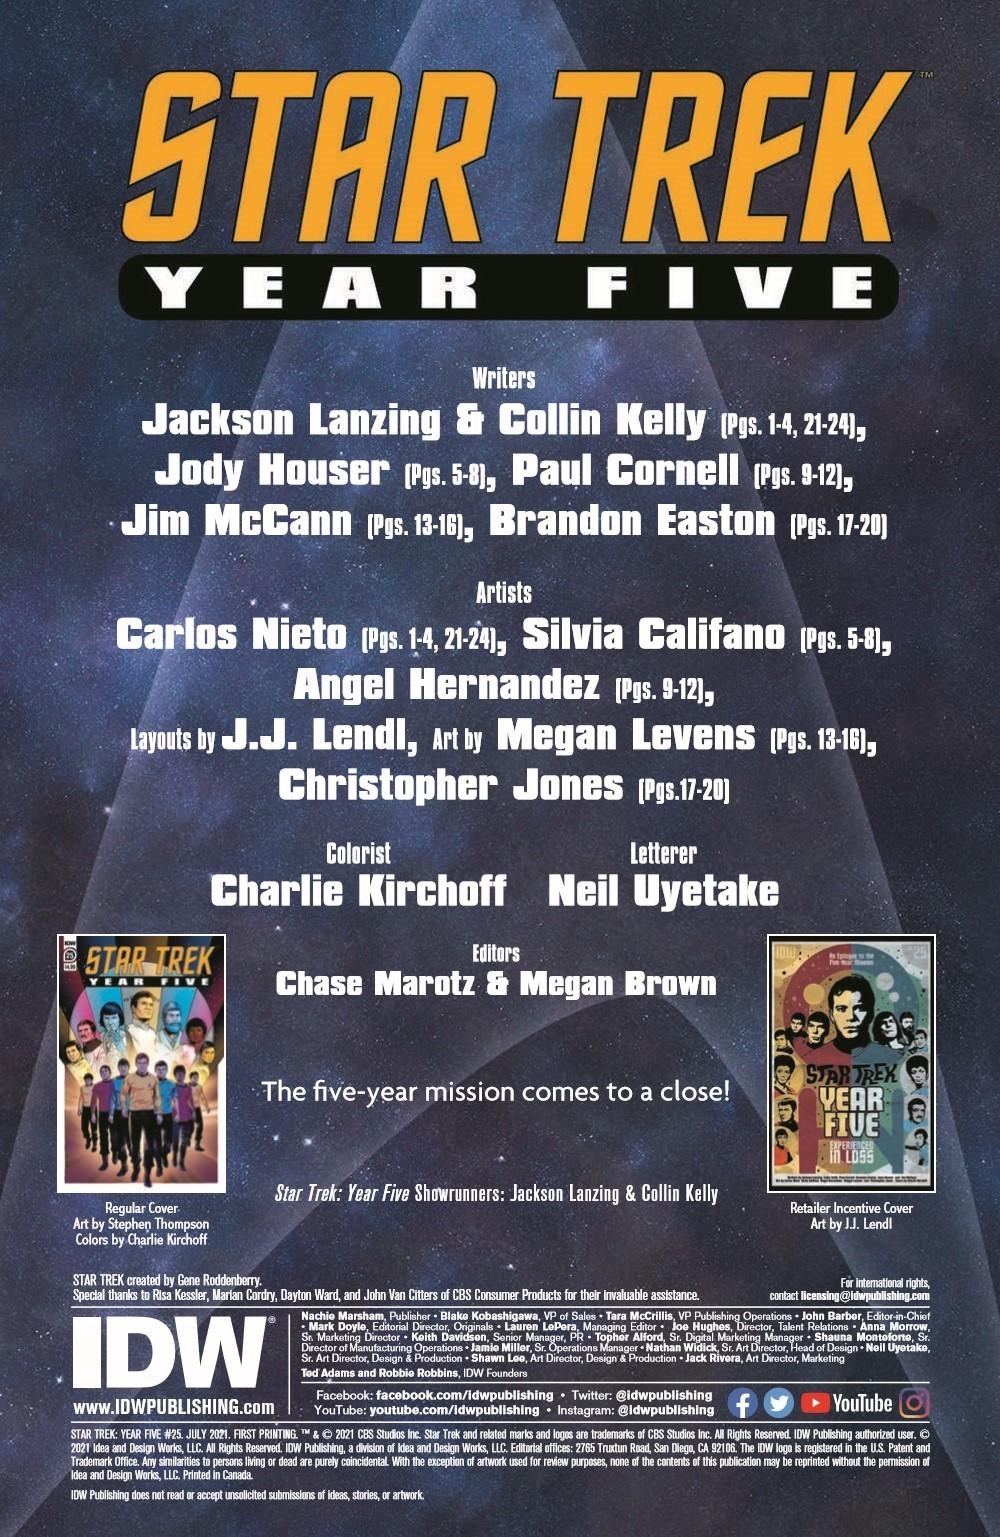 ST_YearFive25-pr-2 ComicList Previews: STAR TREK YEAR FIVE #25